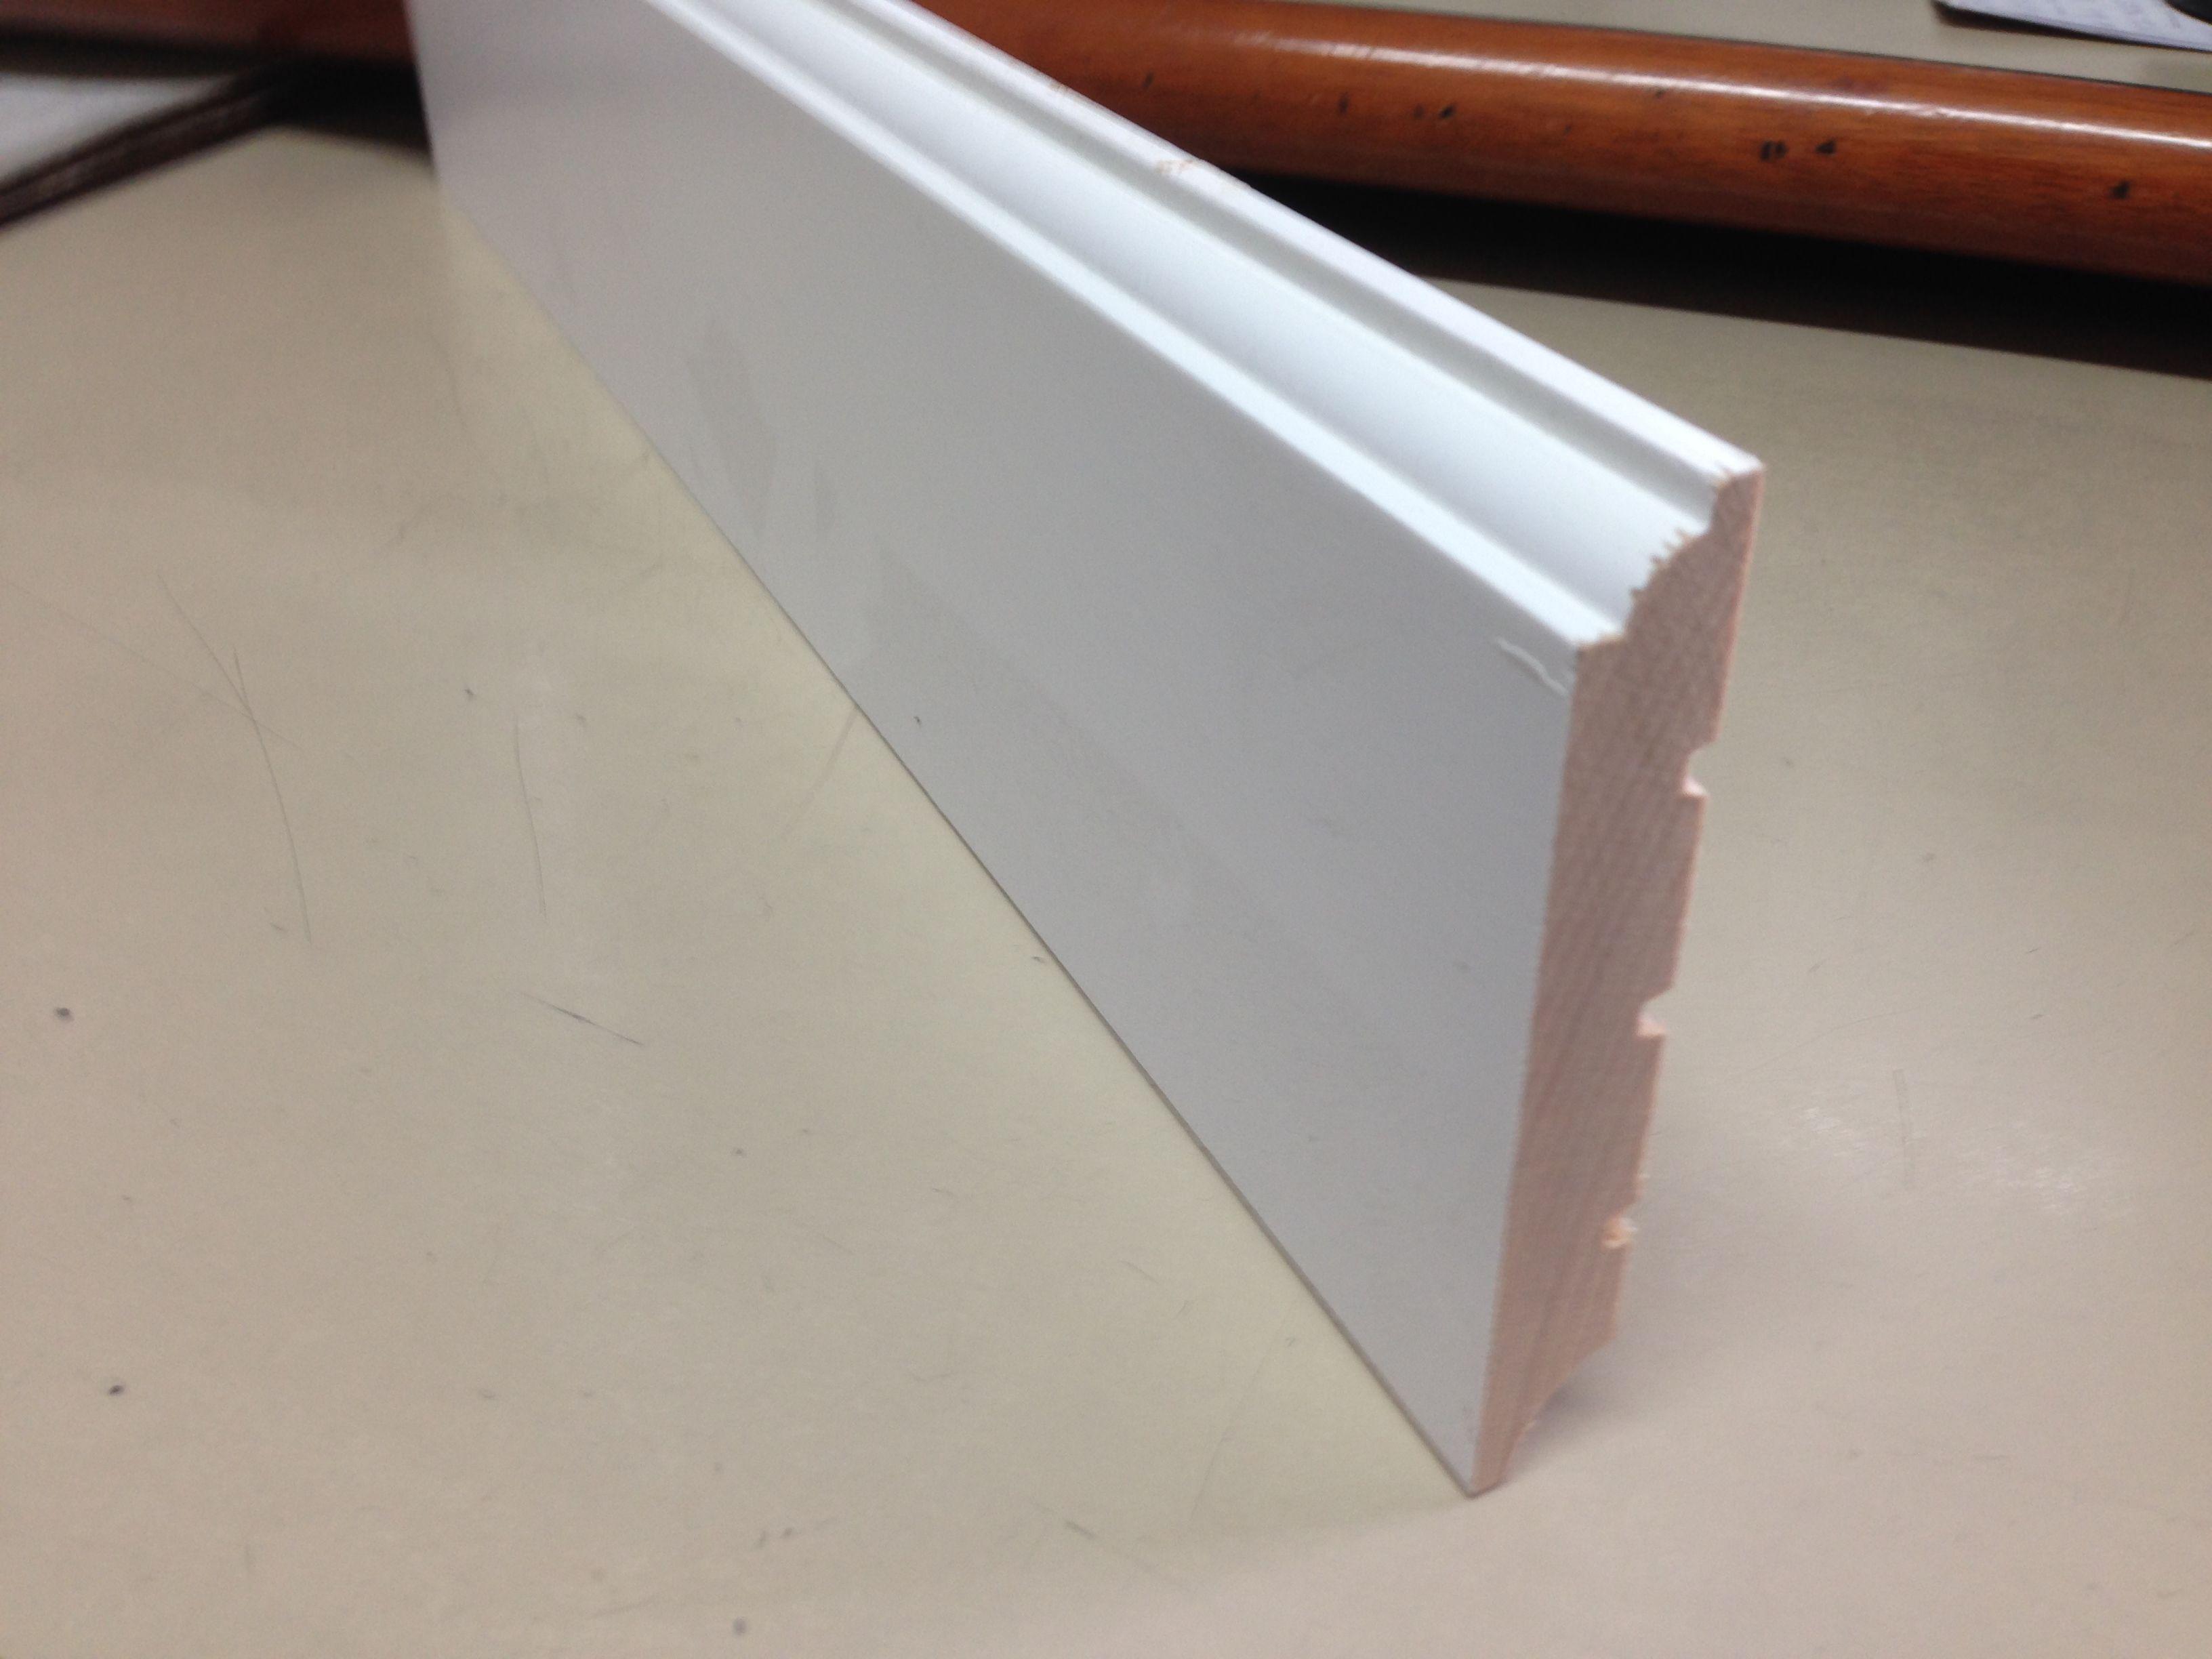 Zocalo rodapie madera maciza lacado en blanco con canto - Molduras de madera decorativas ...